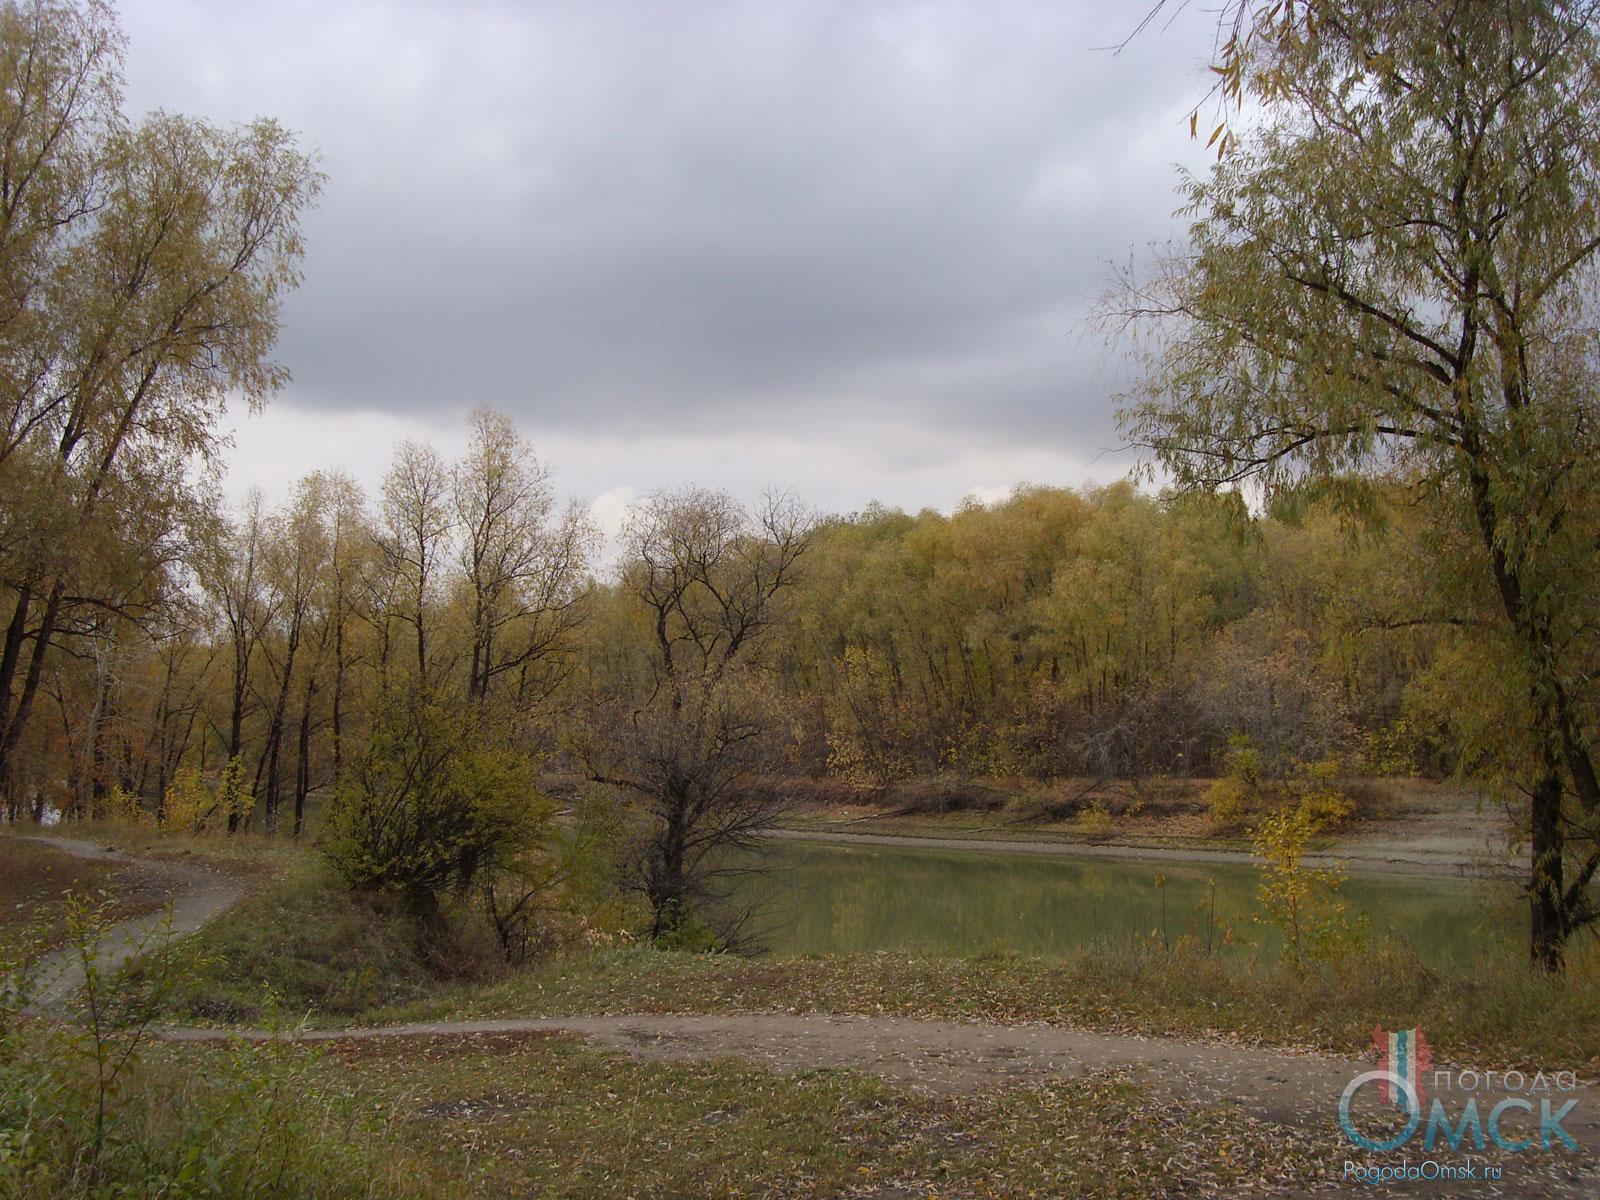 Октябрьский пейзаж